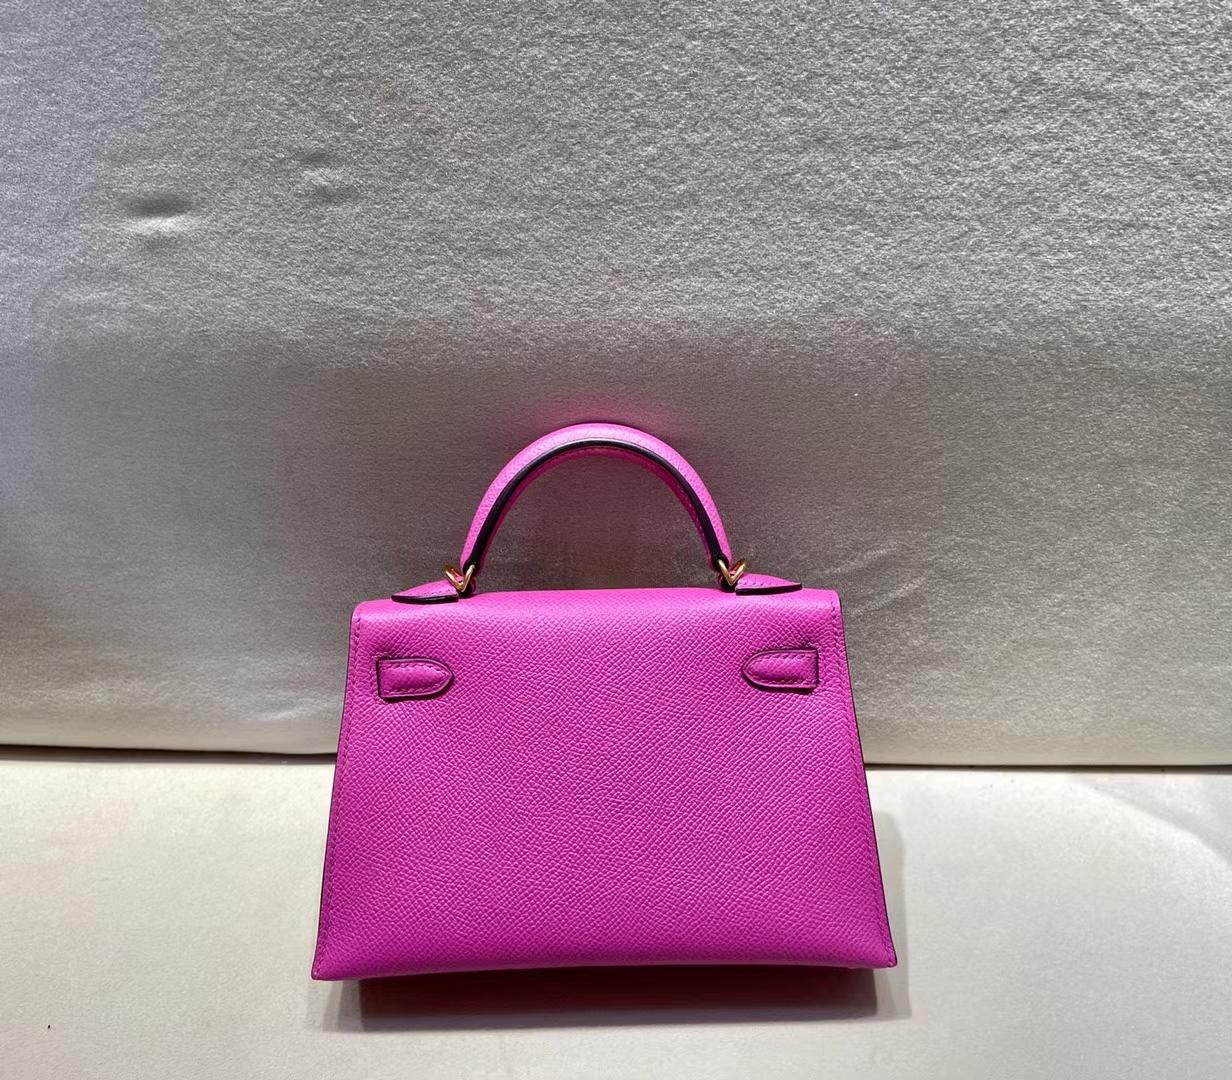 Hermès(爱马仕)miniKelly 二代 epsom 玉兰花粉 9i 金扣 顶级品质 现货